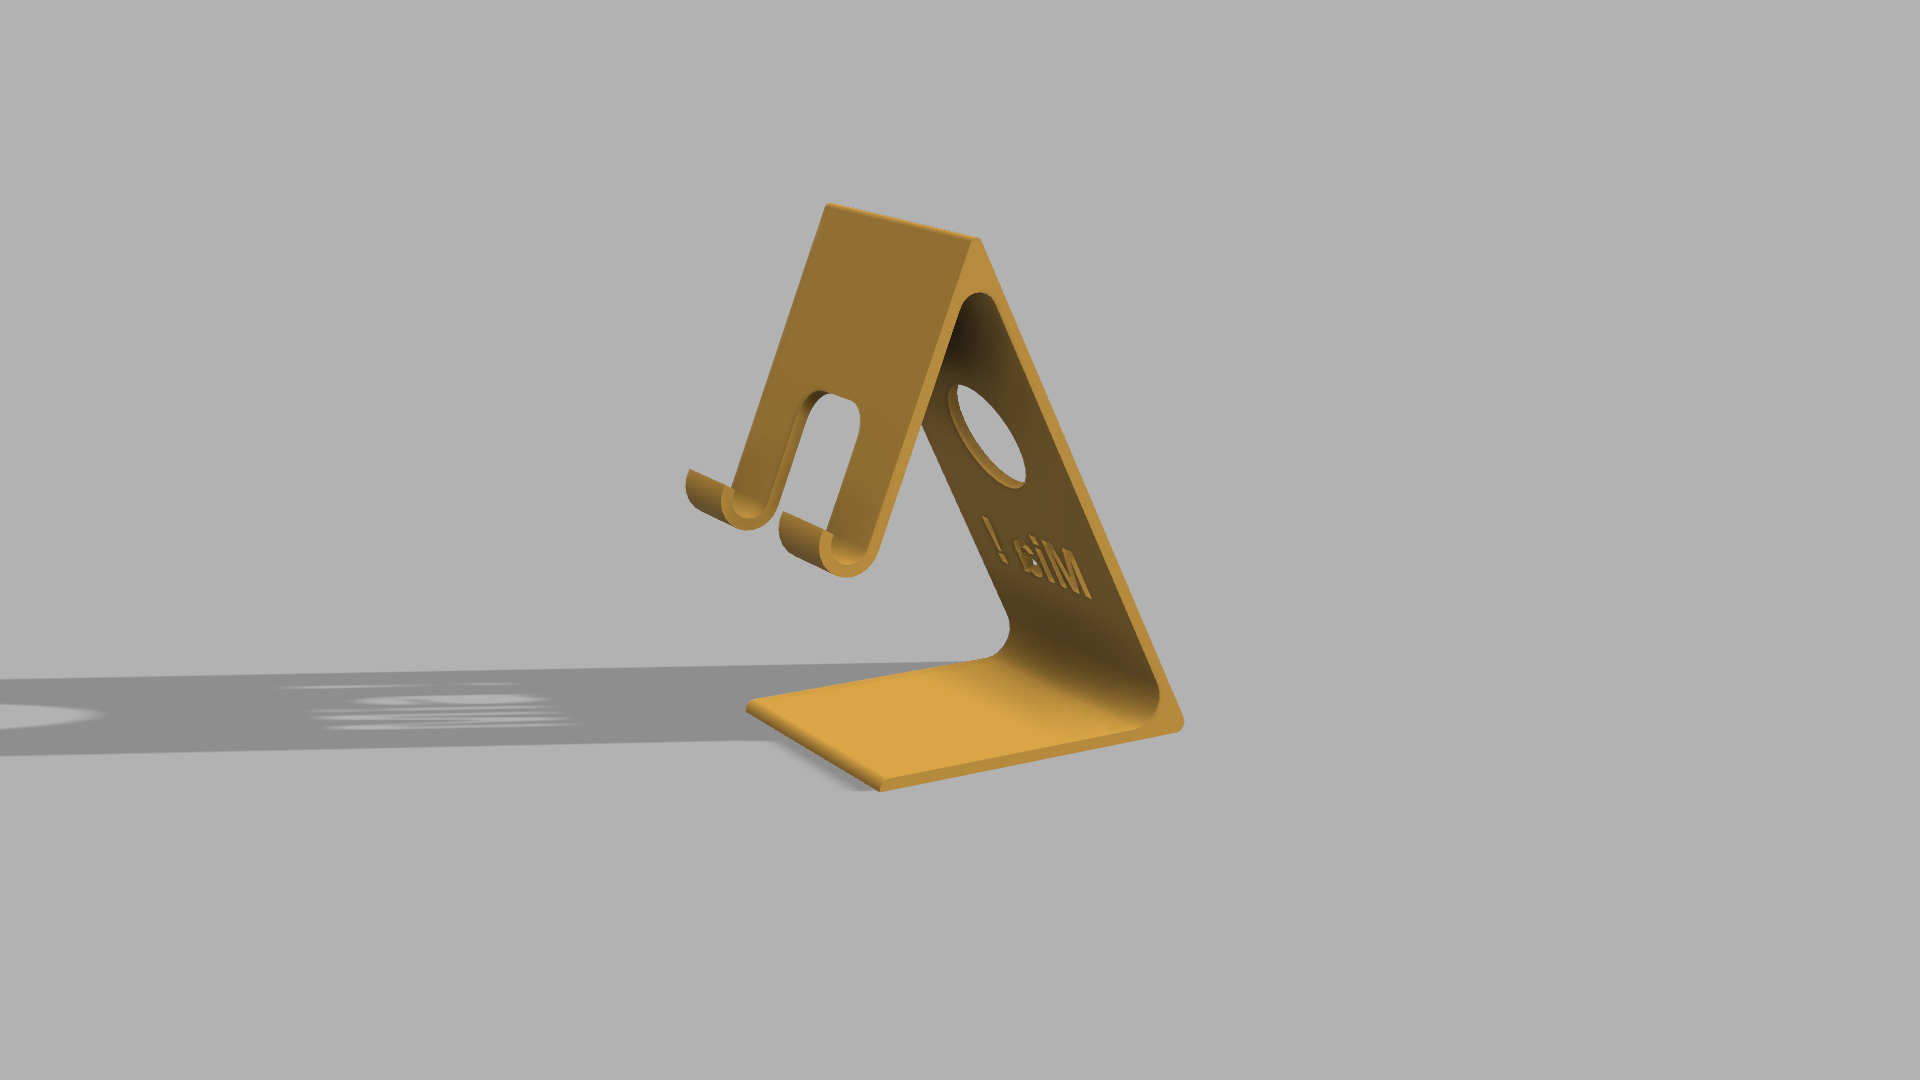 Sup_Mia v0.png Download free STL file Phone Holder • Model to 3D print, RachidAliOsinachi